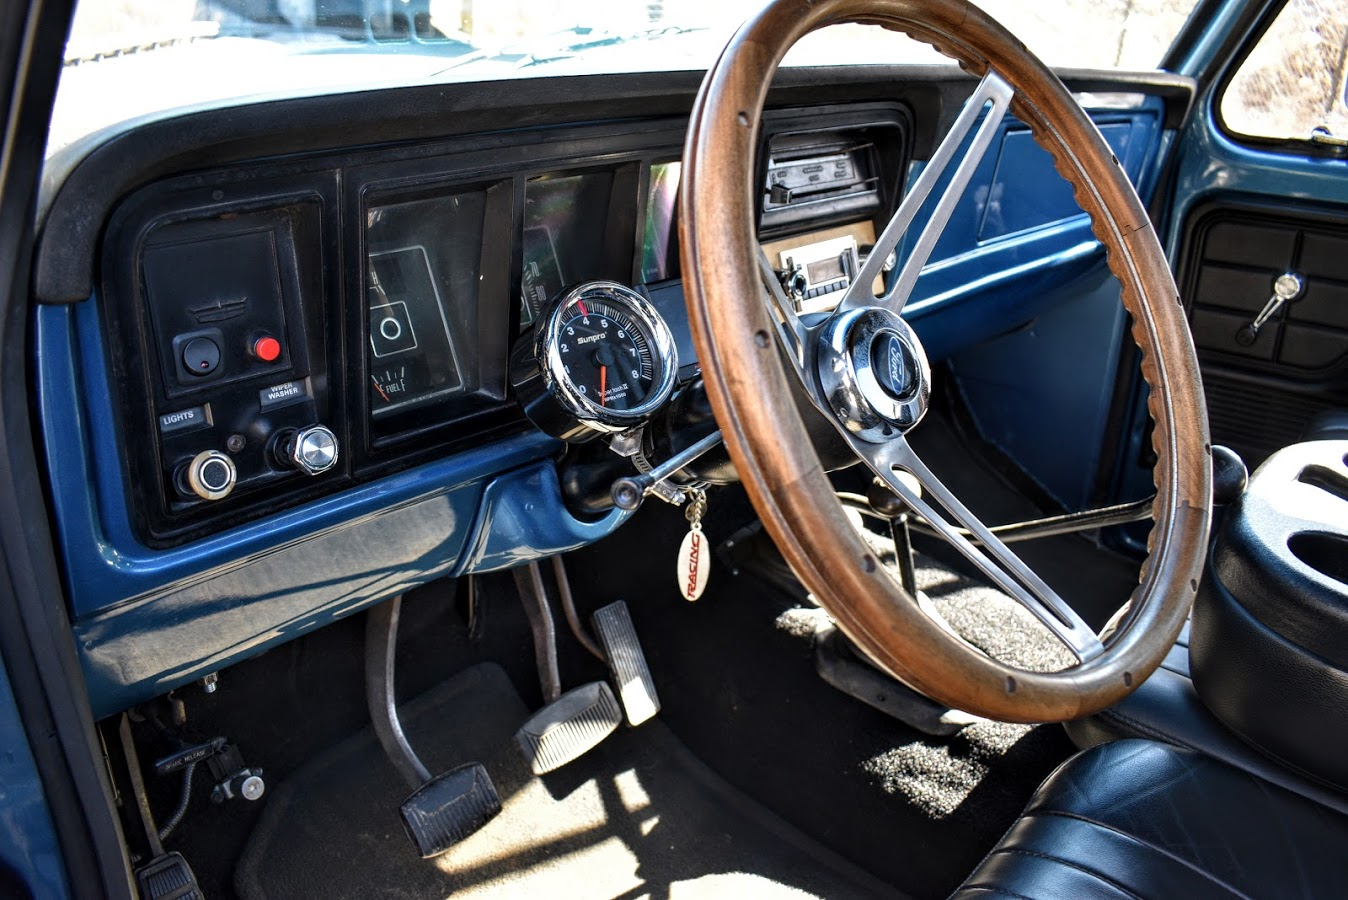 1973 Ford F250 Highboy With Wood Deck Bed 9.JPG